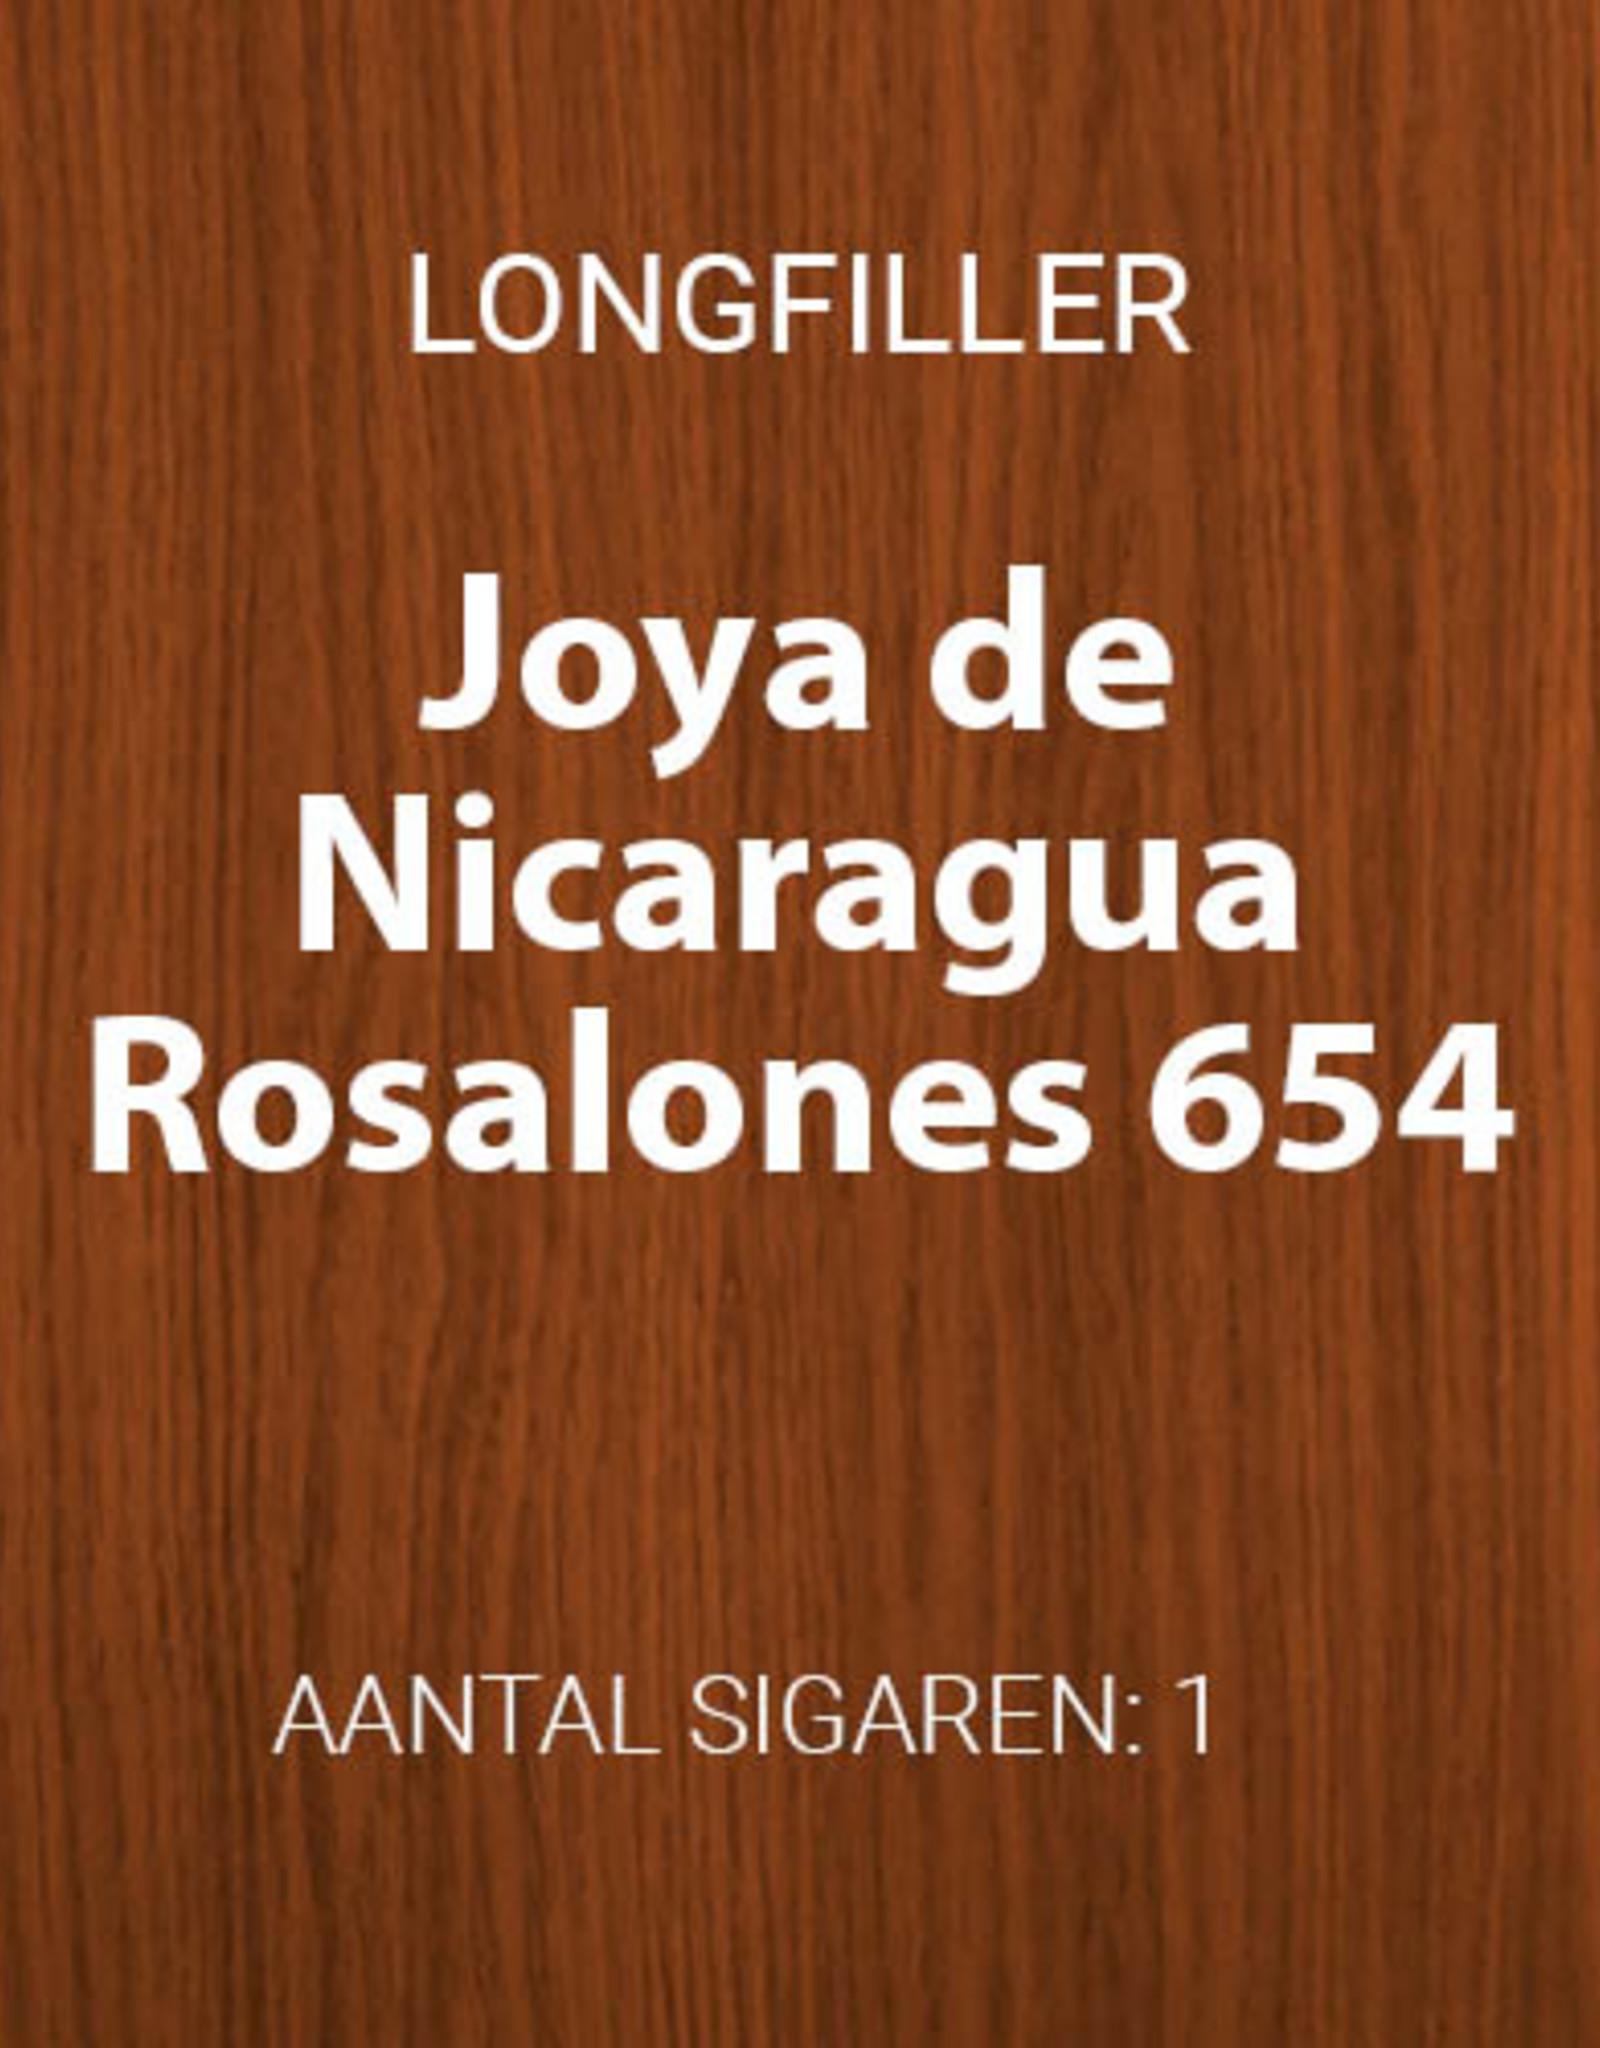 Joya de Nicaragua Rosalones 654 longfiller